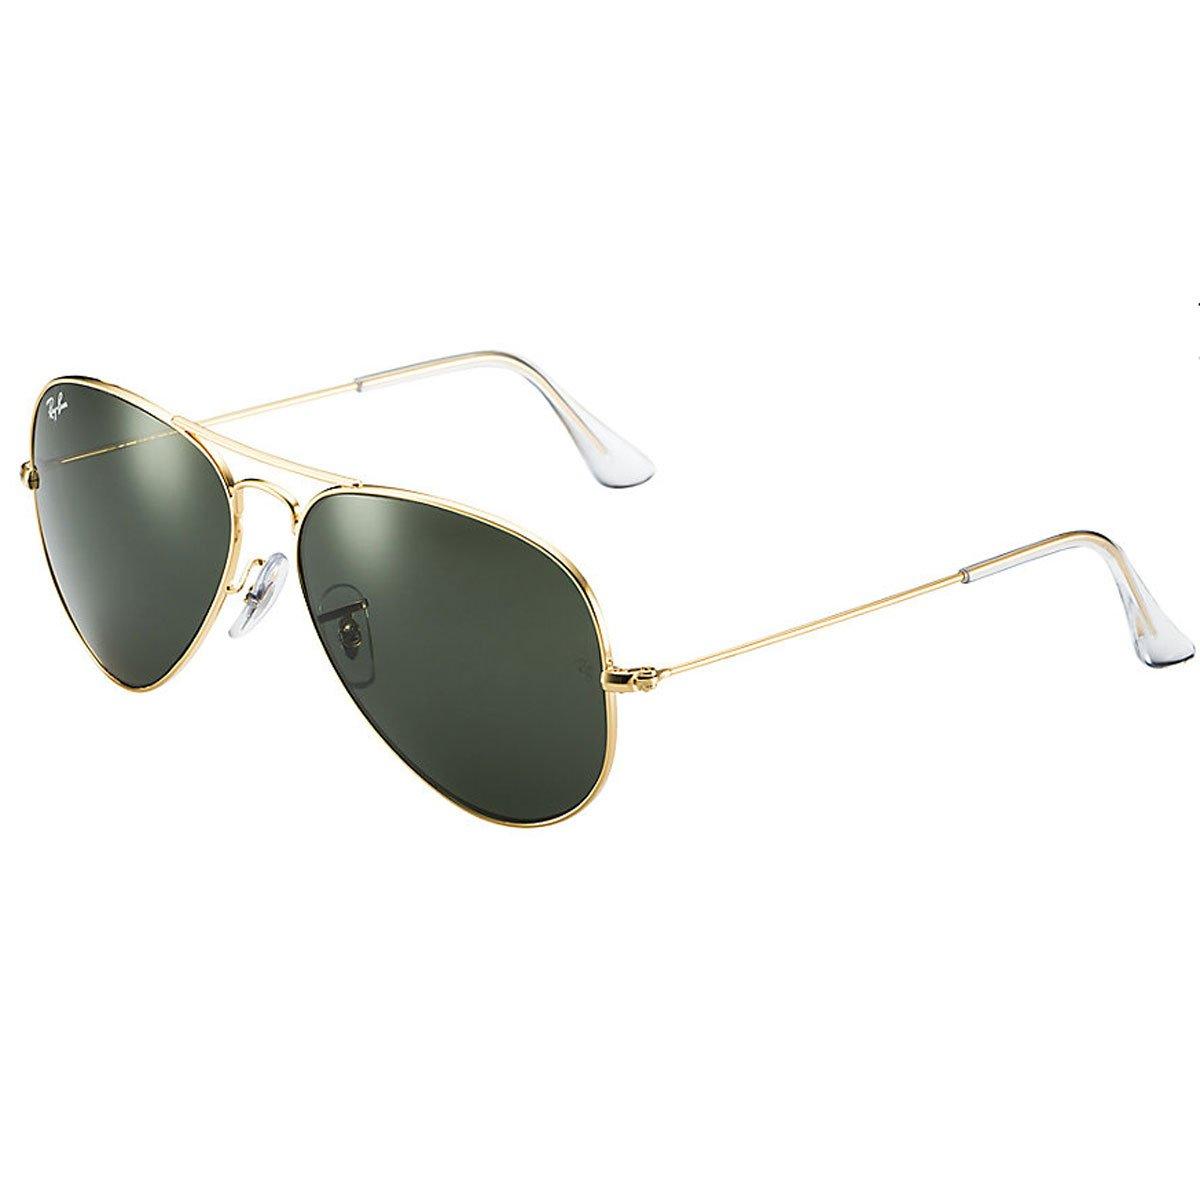 49f8fe1c868c64 Amazon.com  Ray-Ban Aviator Metal Sunglasses RB3025 001 51 - Arista Gold  Crystal Brown Gradient - Medium Size 58mm Description change to Ray-Ban  Aviator ...